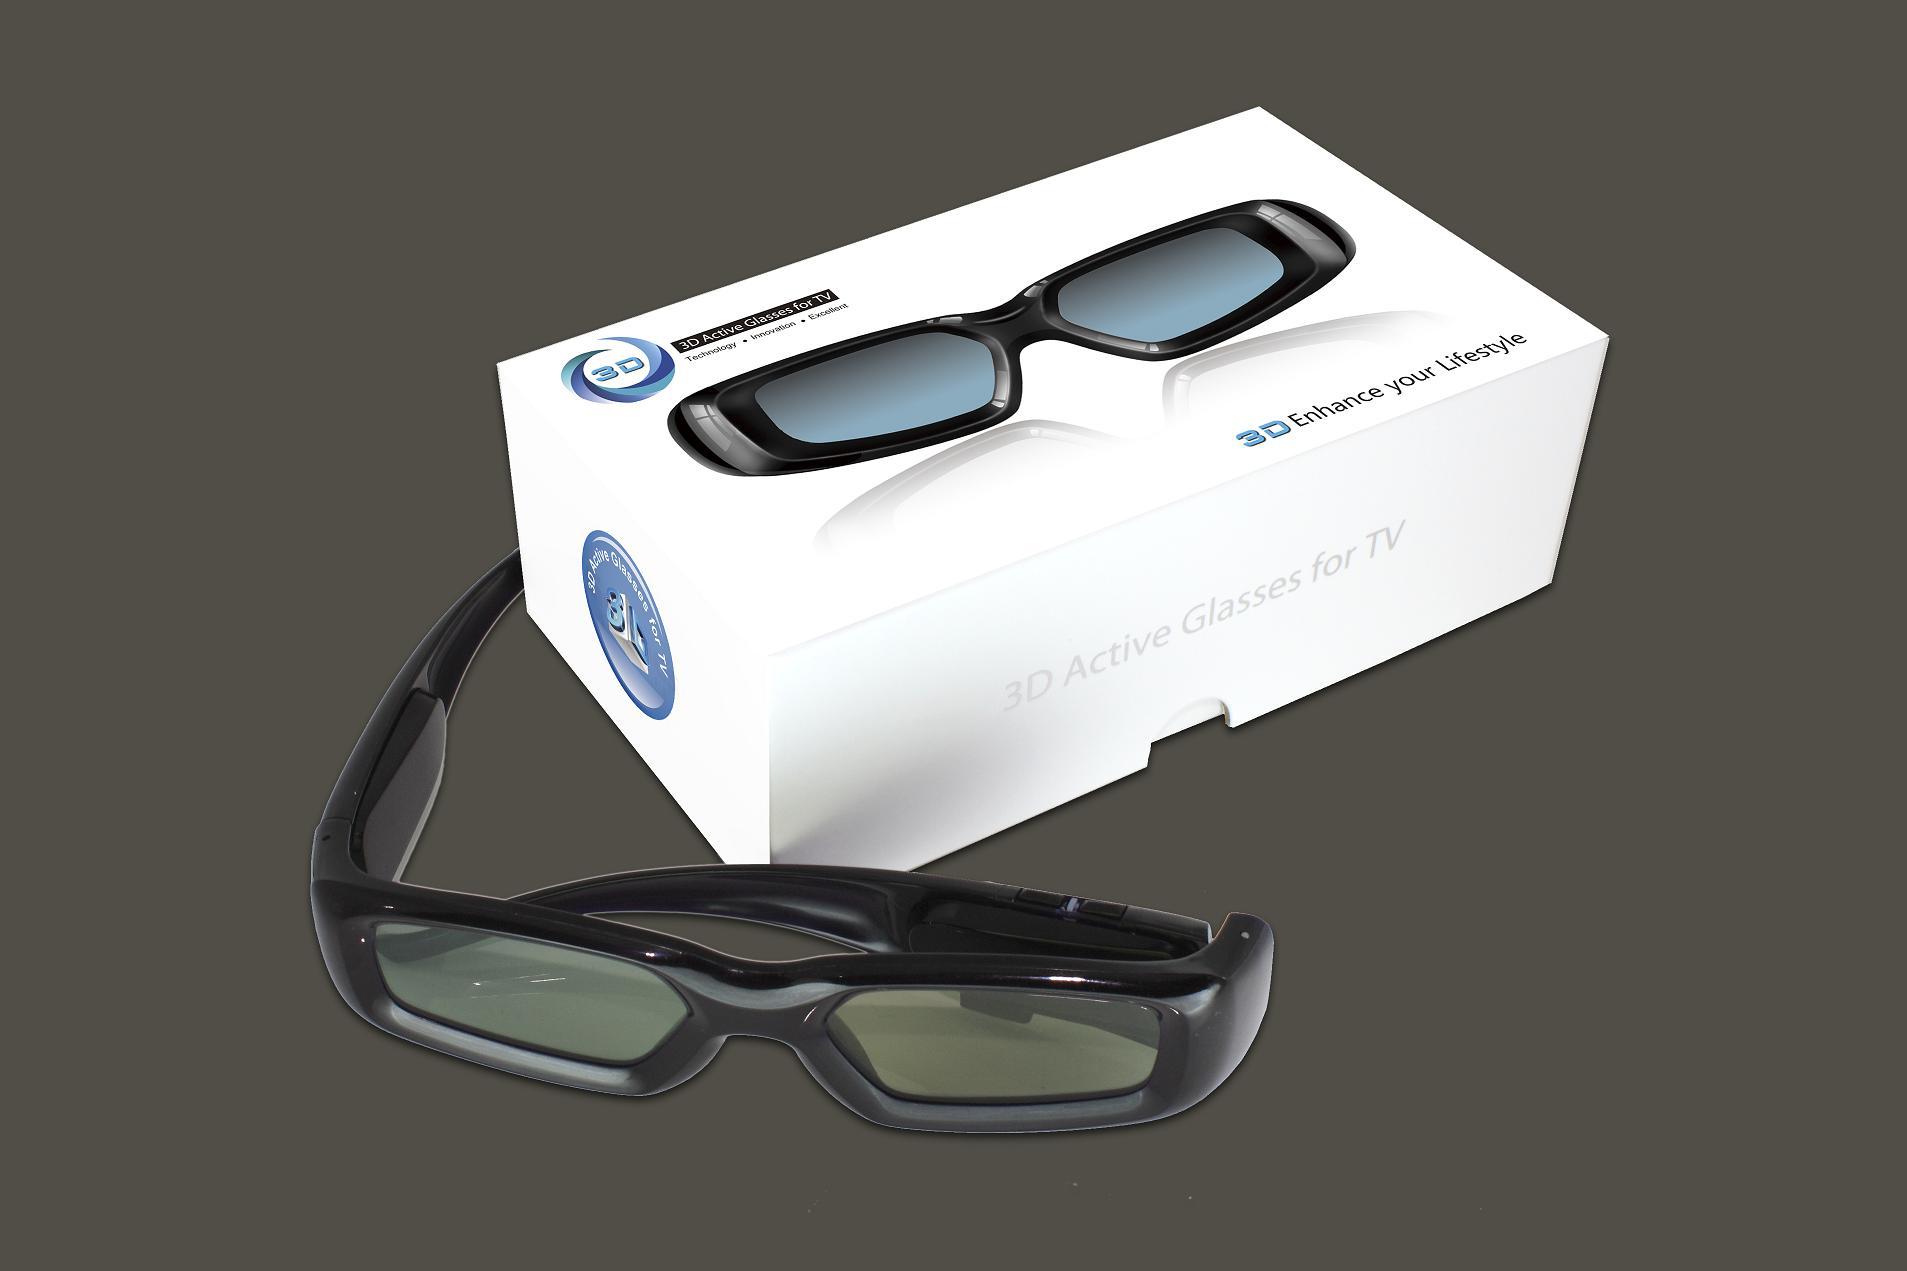 Universal 3d Shutter 3d Brille Fur Sony Panasonic Lg Samsung Lcd Led Philips Sharp Toshiba Mitsubishi 3d Tvs Precorn